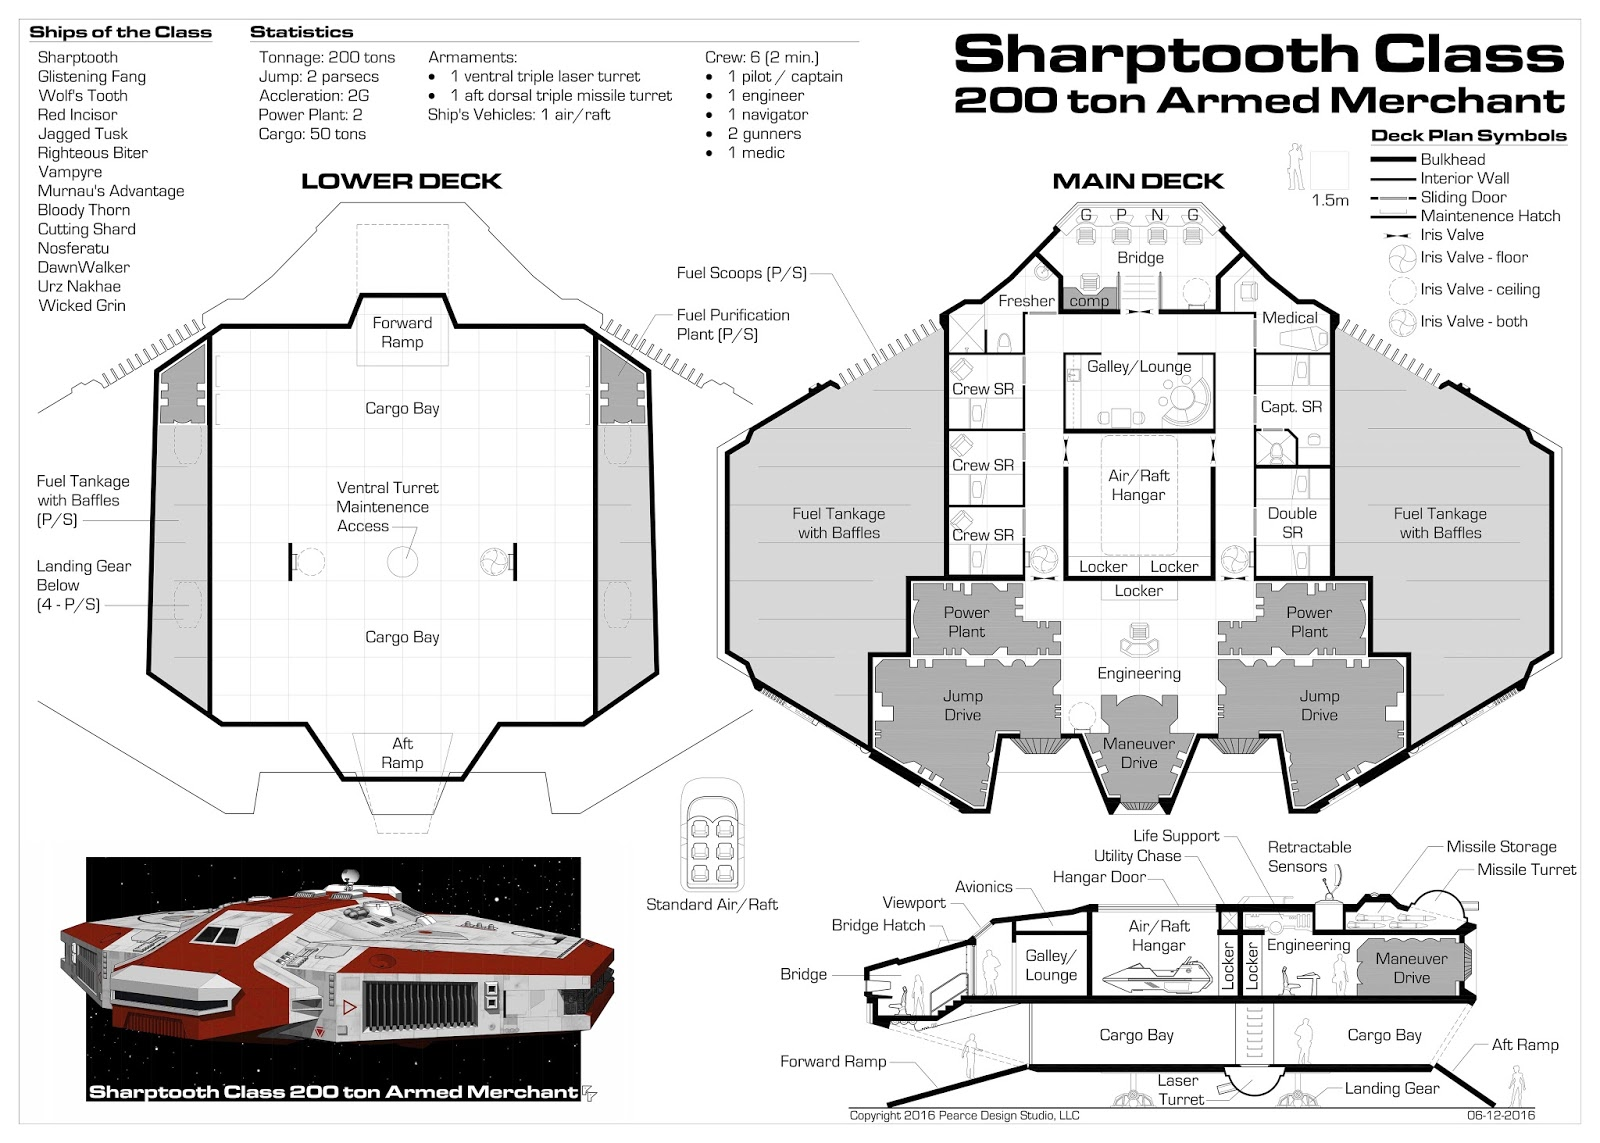 Yet another traveller blog deck plans starship 200 ton armed deck plans starship 200 ton armed merchant baanklon Choice Image